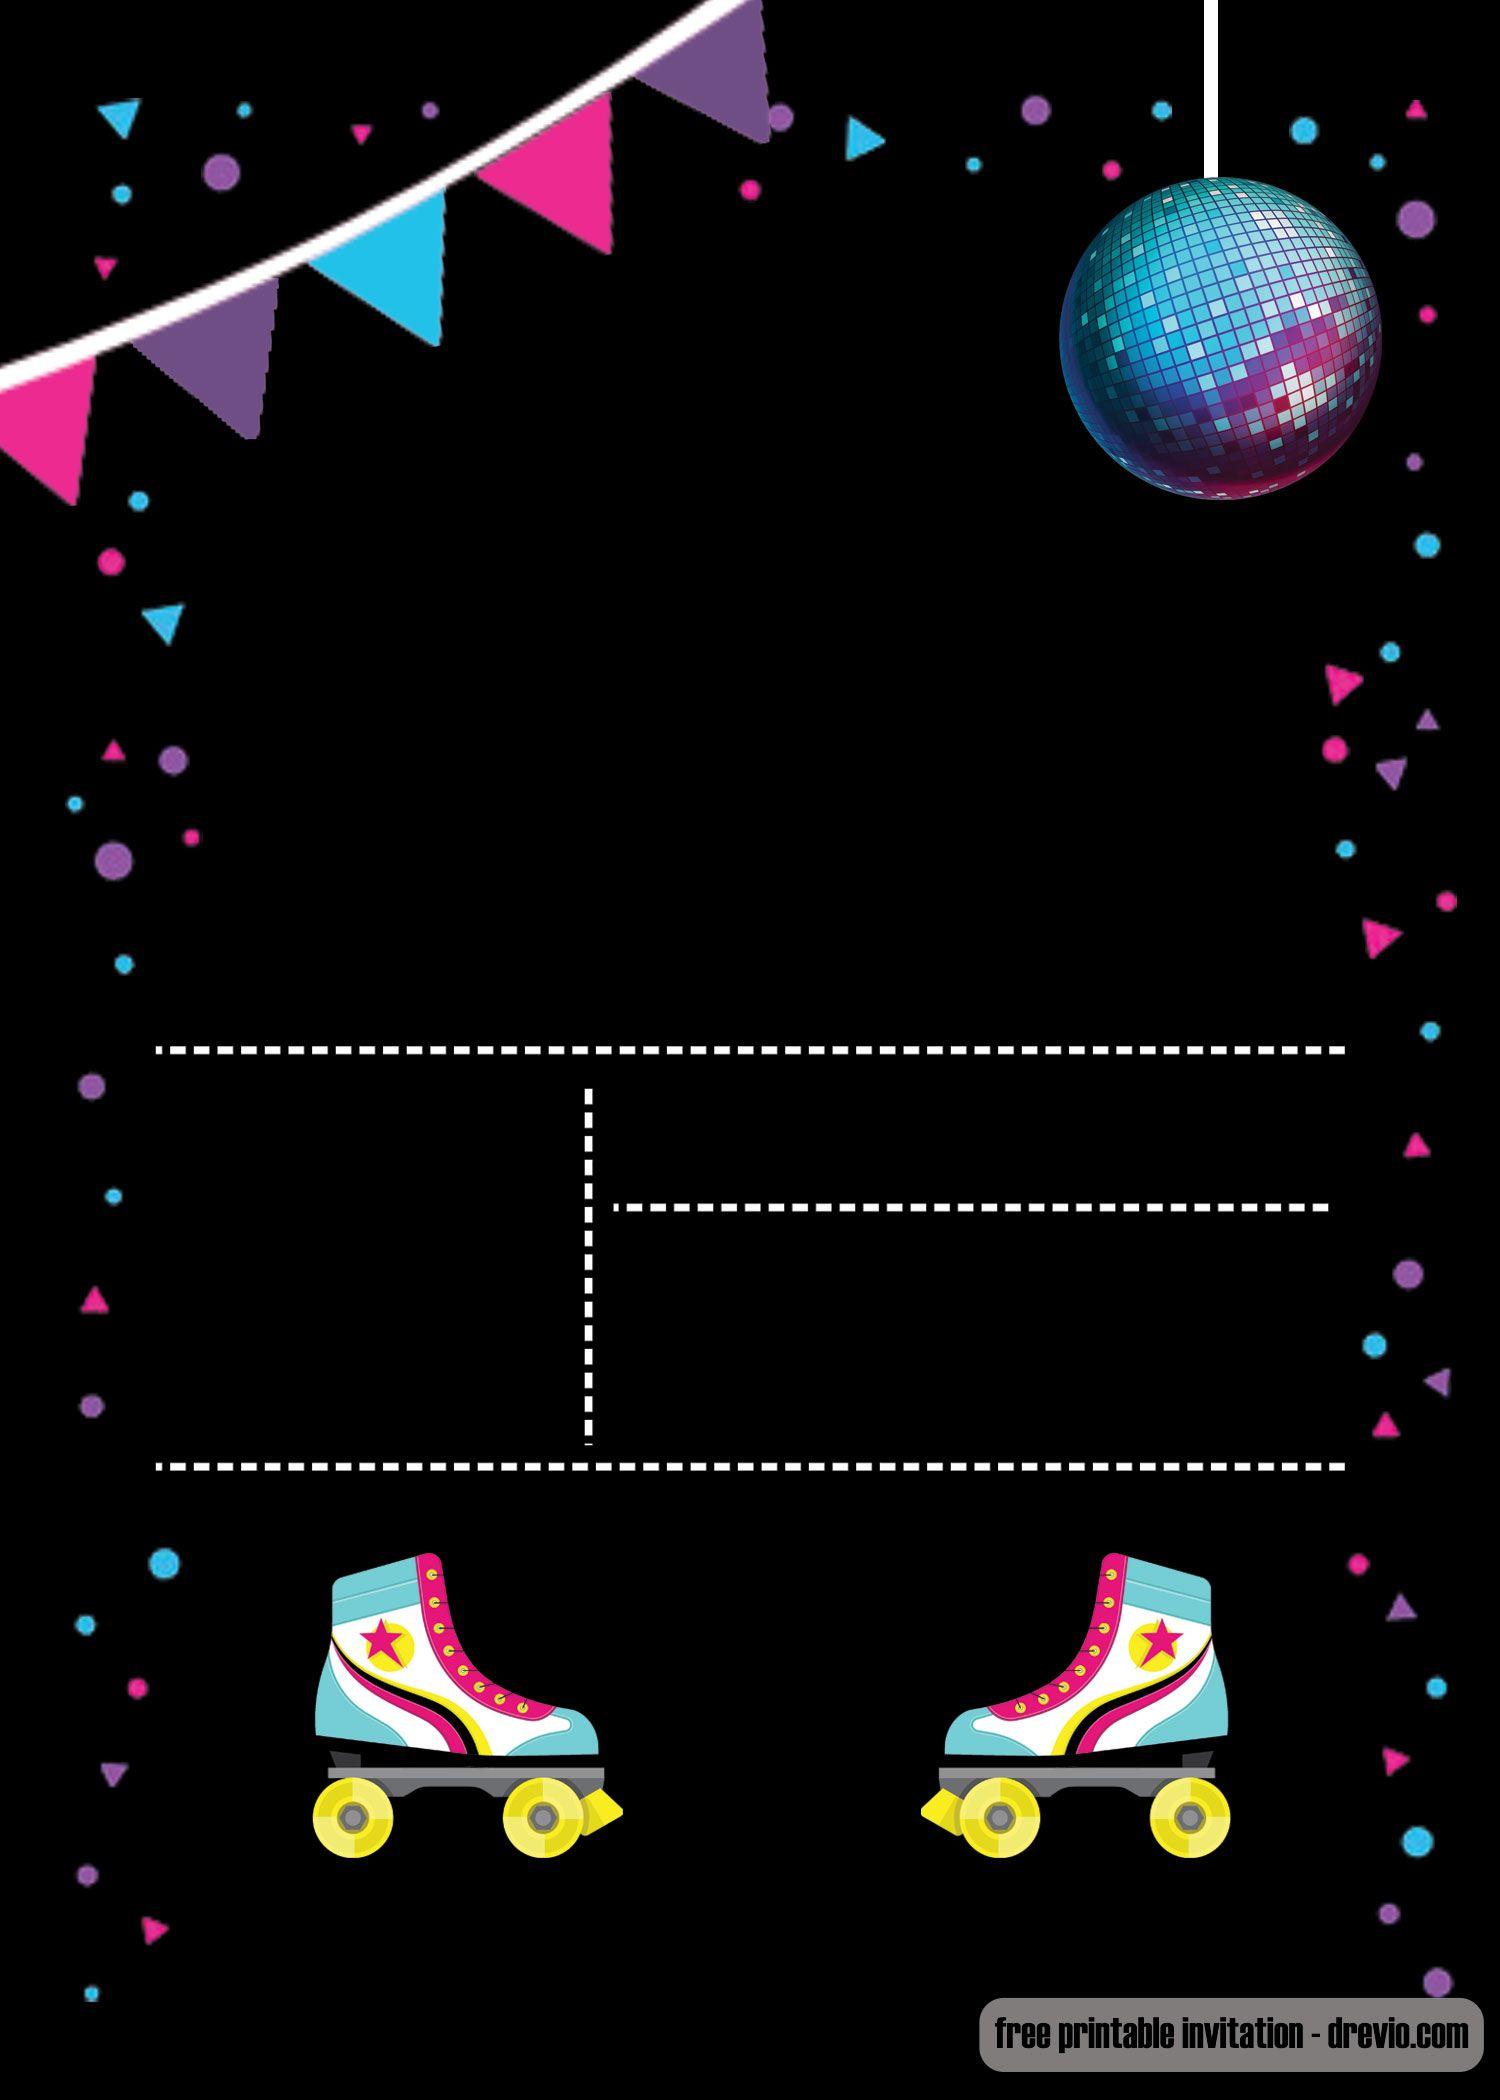 Free Printable Roller Skating Invitation Template | Invites - Free Printable Skating Invitations